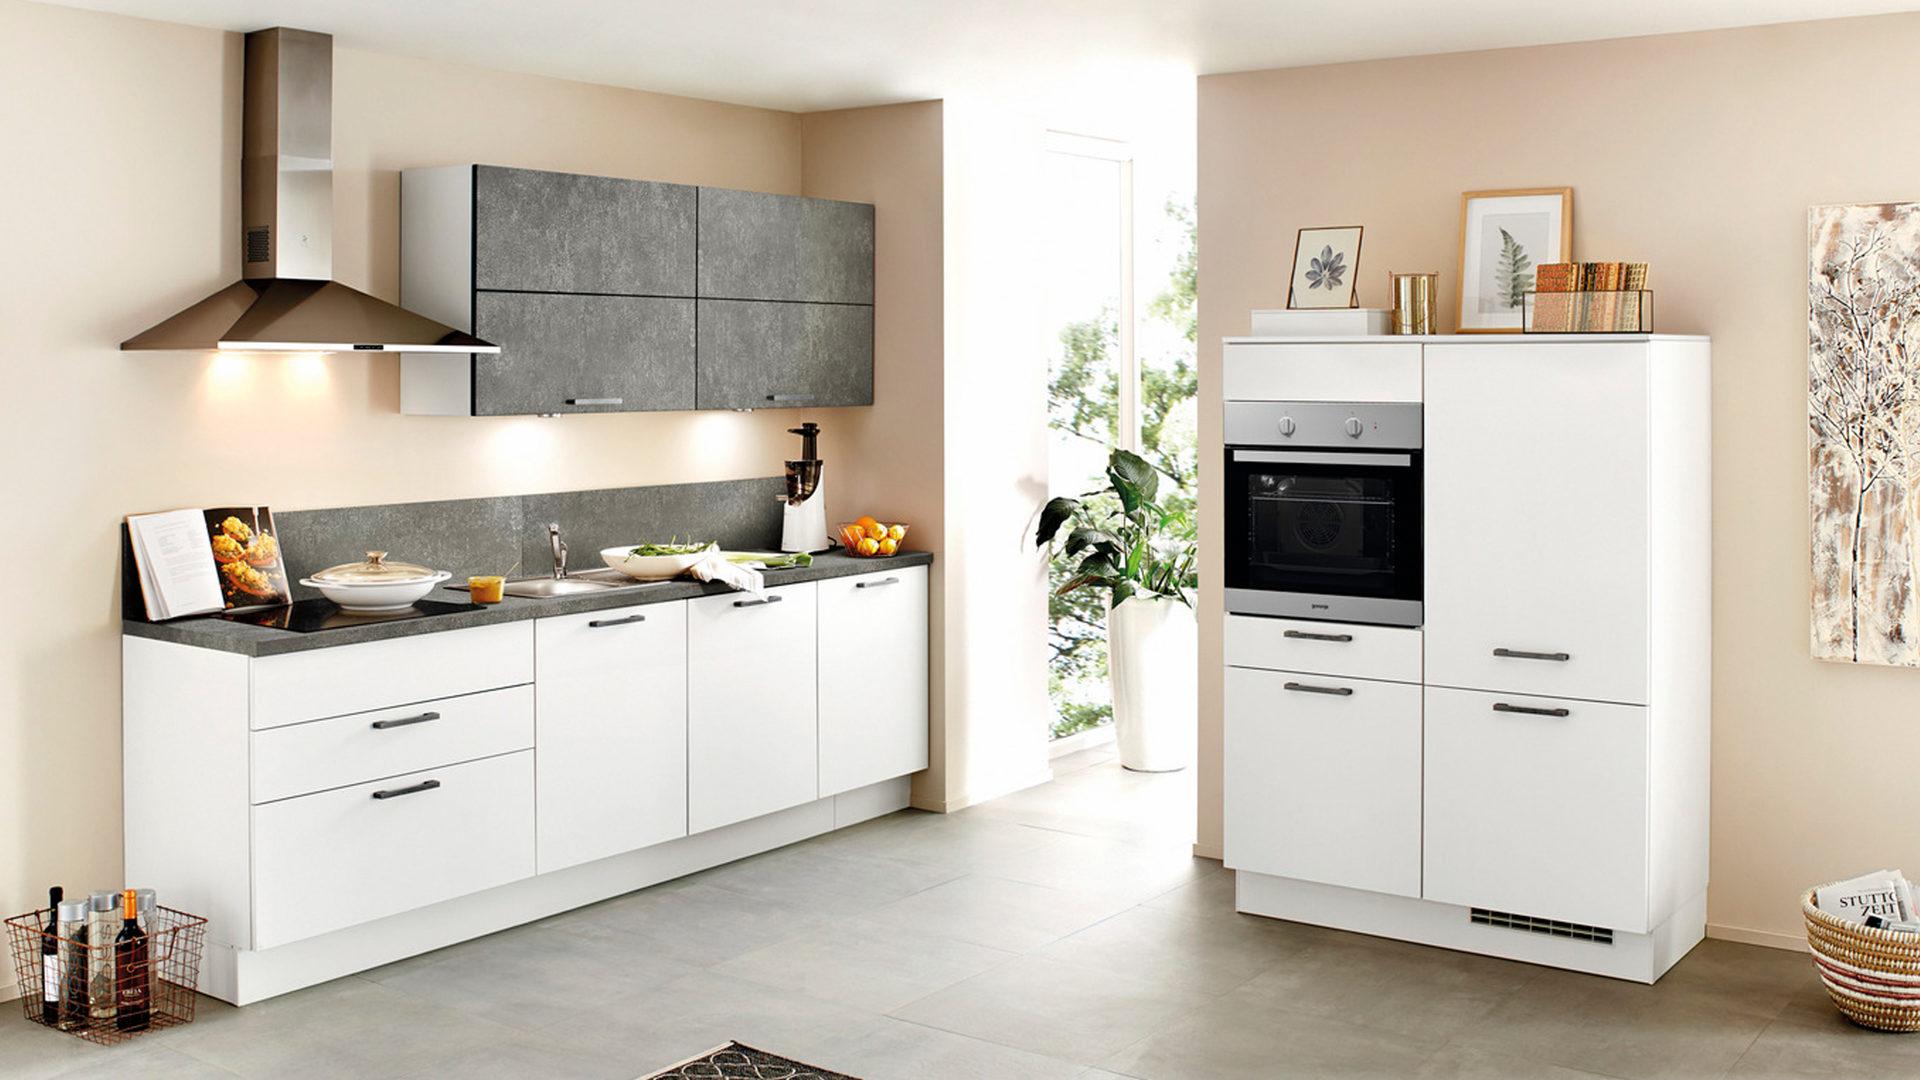 Möbel Boer Coesfeld Räume Küche Einbauküche Einbauküche